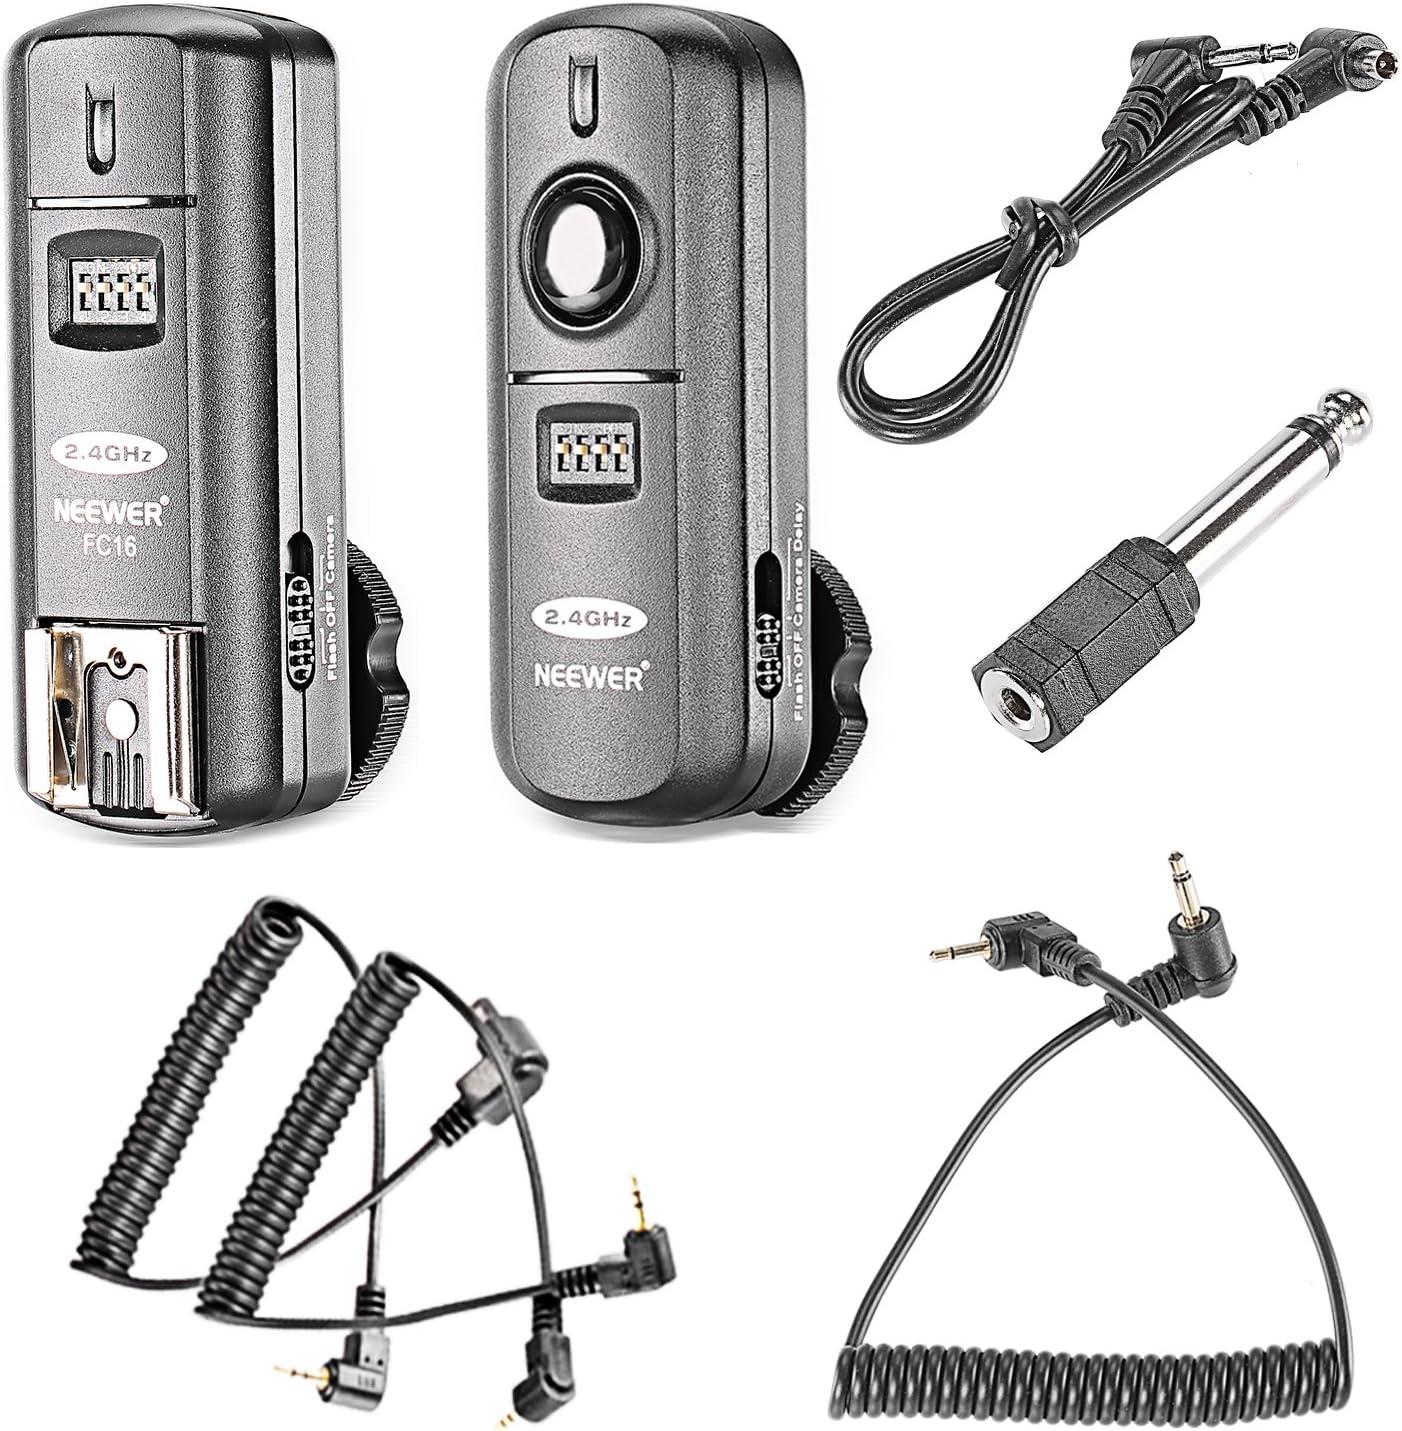 Neewer FC de 16multicanal 2.4GHz 3en 1Flash/Studio Disparador con flash inalámbrico disparador remoto para Canon Rebel T3XS T4i T3i T2i T1i XSi EOS 1100d 1000d 700d 650d 600d 60d 550d 500d 450d 1